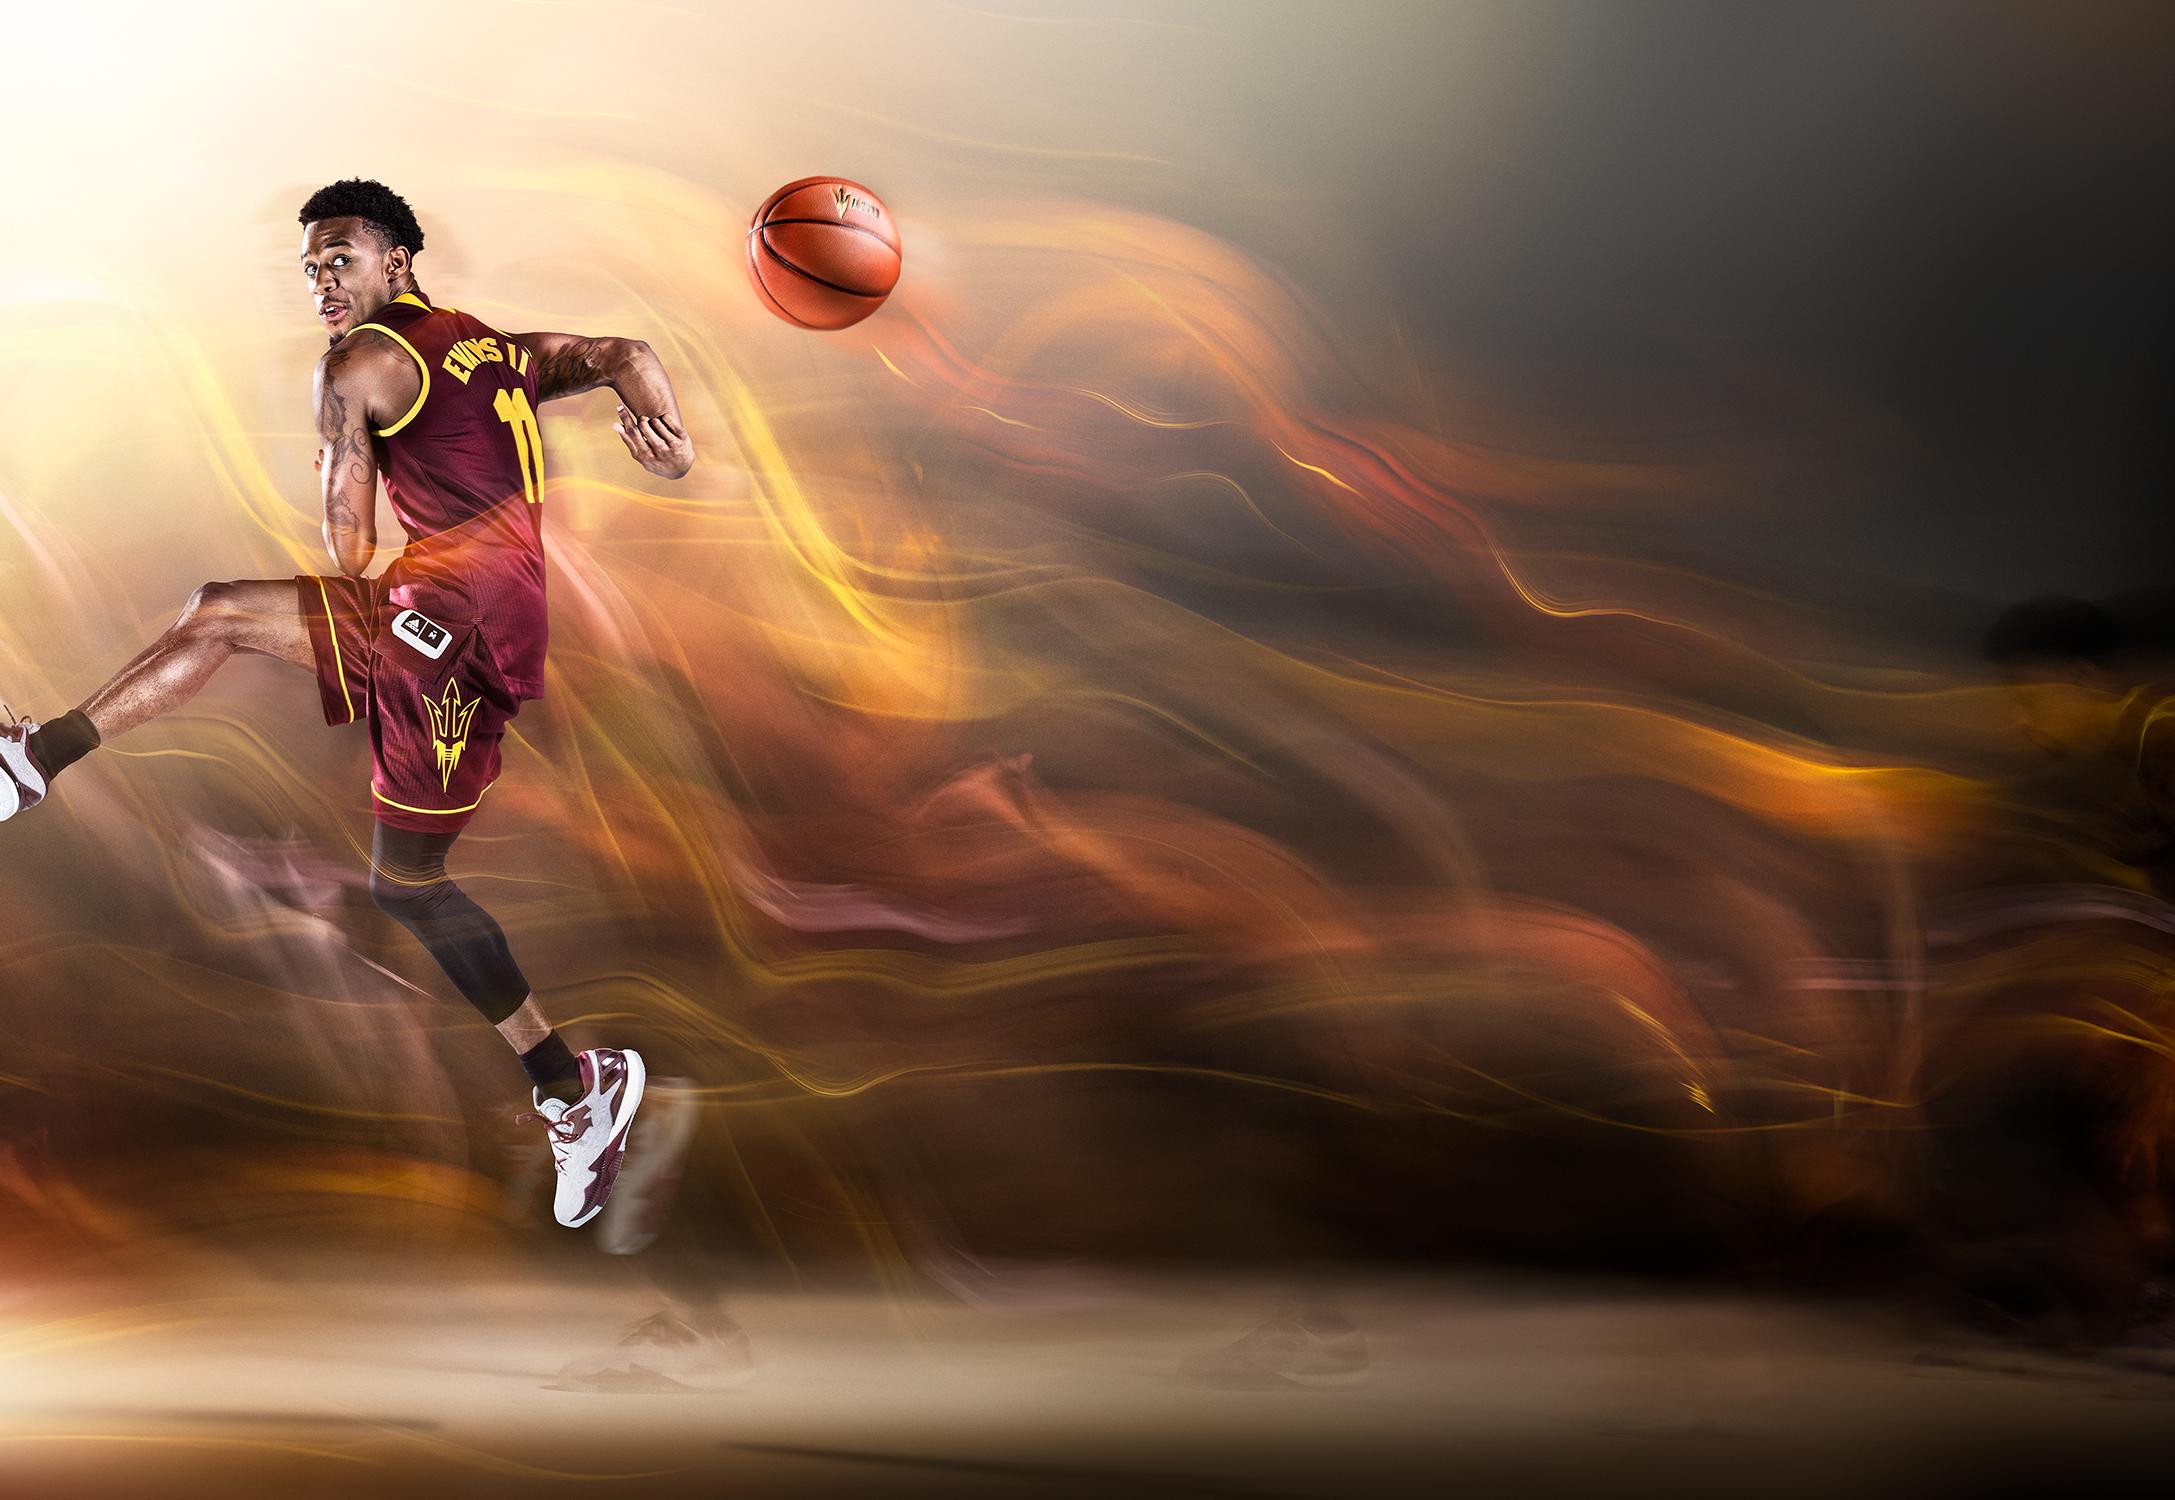 FY17 ASU SUN DEVIL  FOOTBALL Photoshoot  IGNITE THE POWER WITHIN   Creative + Art Direction  with  photographer   Blair Bunting    cr8@ sun devil athletics, arizona state university